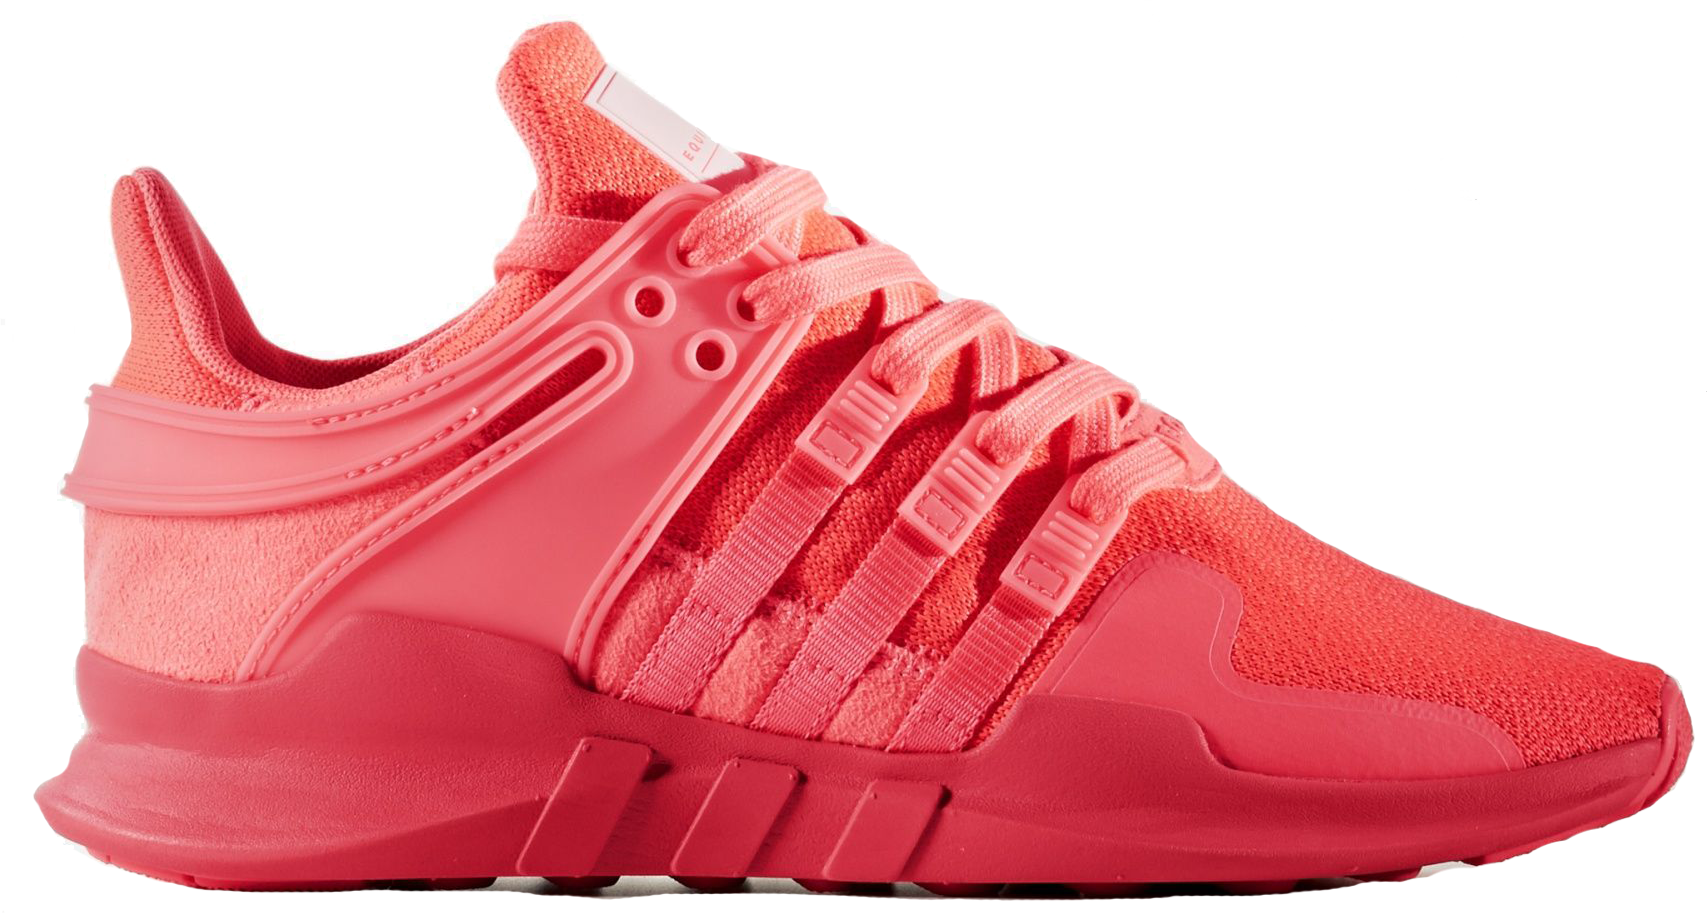 adidas EQT Support ADV Turbo Pink (W